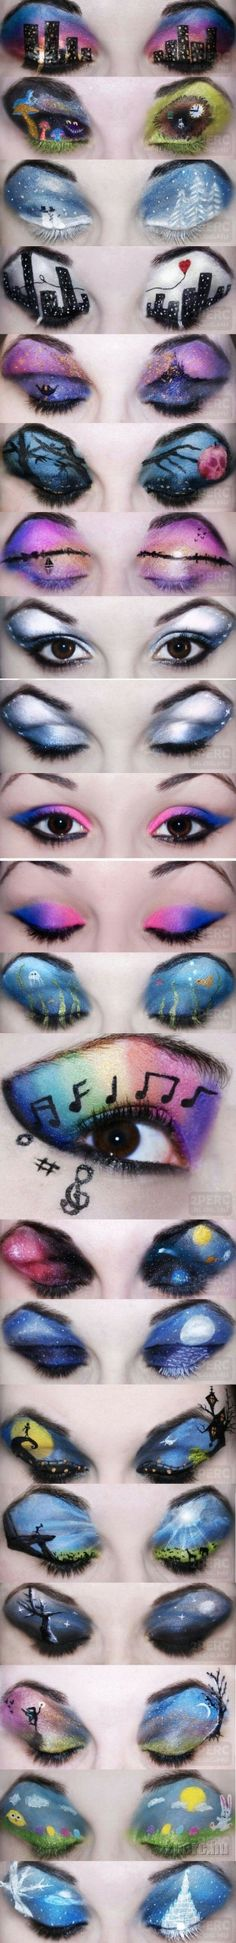 Awesome eye makeup!